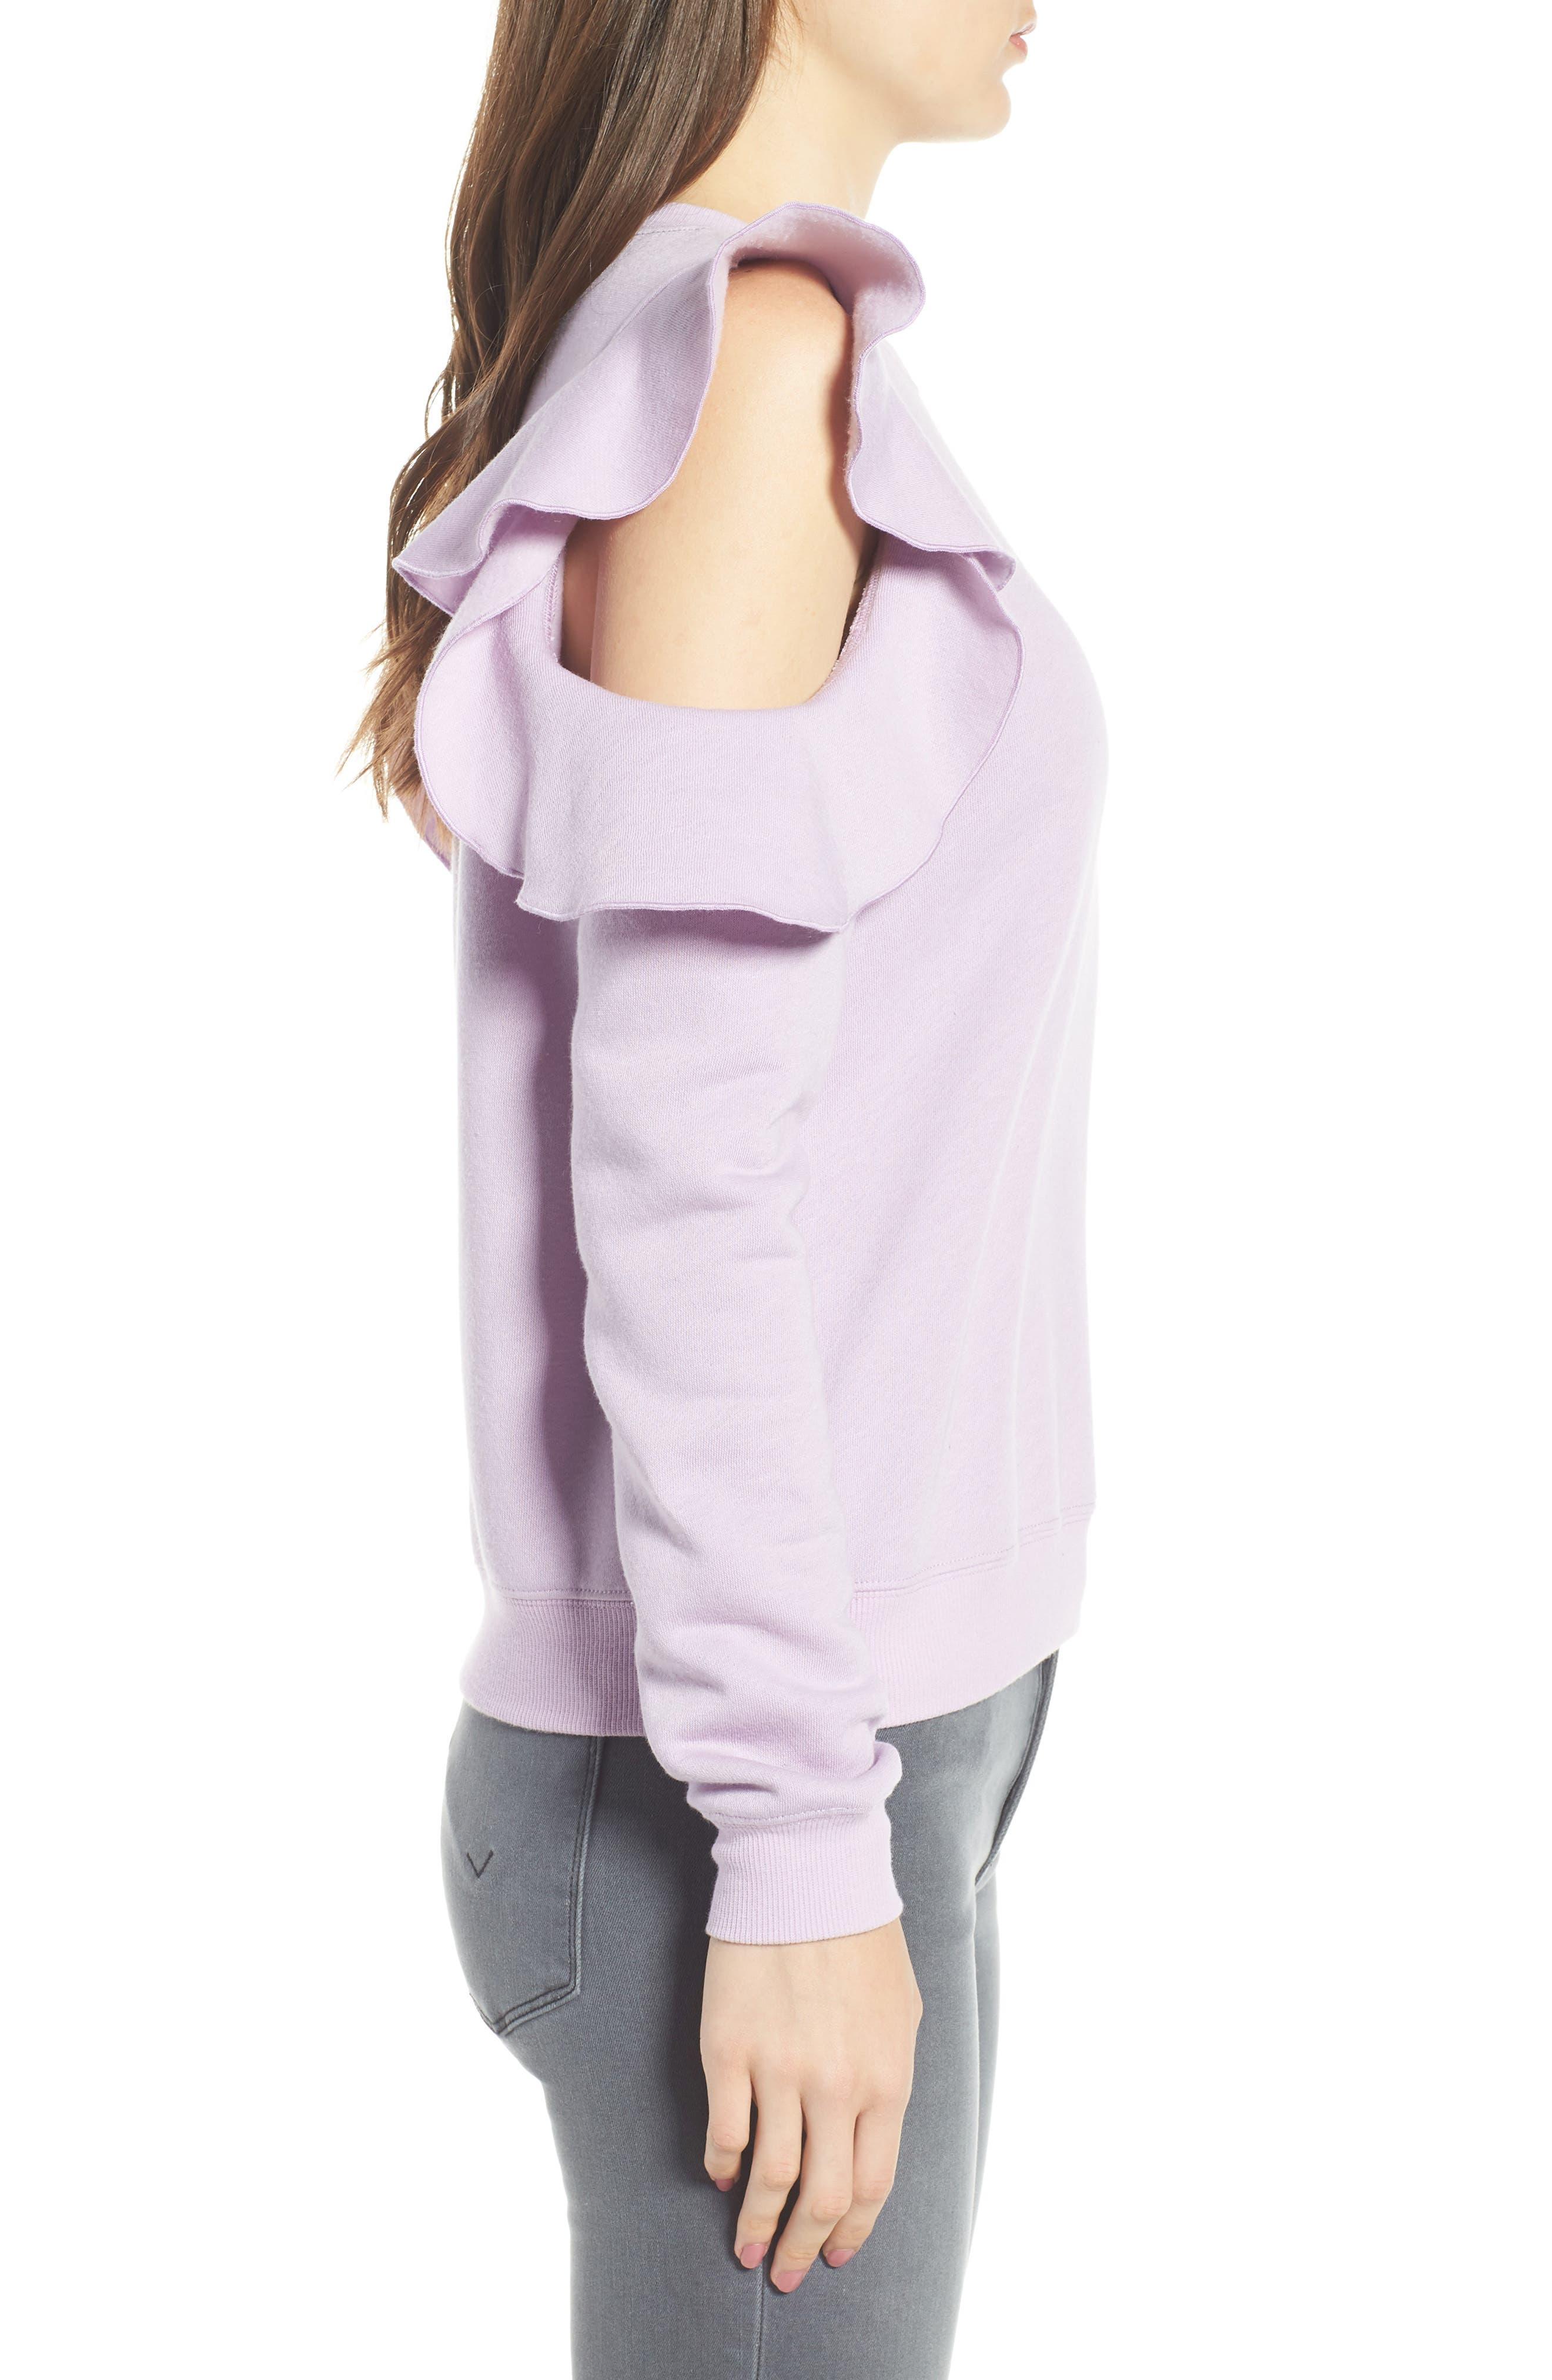 REBECCA MINKOFF, Gracie Cold Shoulder Sweatshirt, Alternate thumbnail 4, color, 502